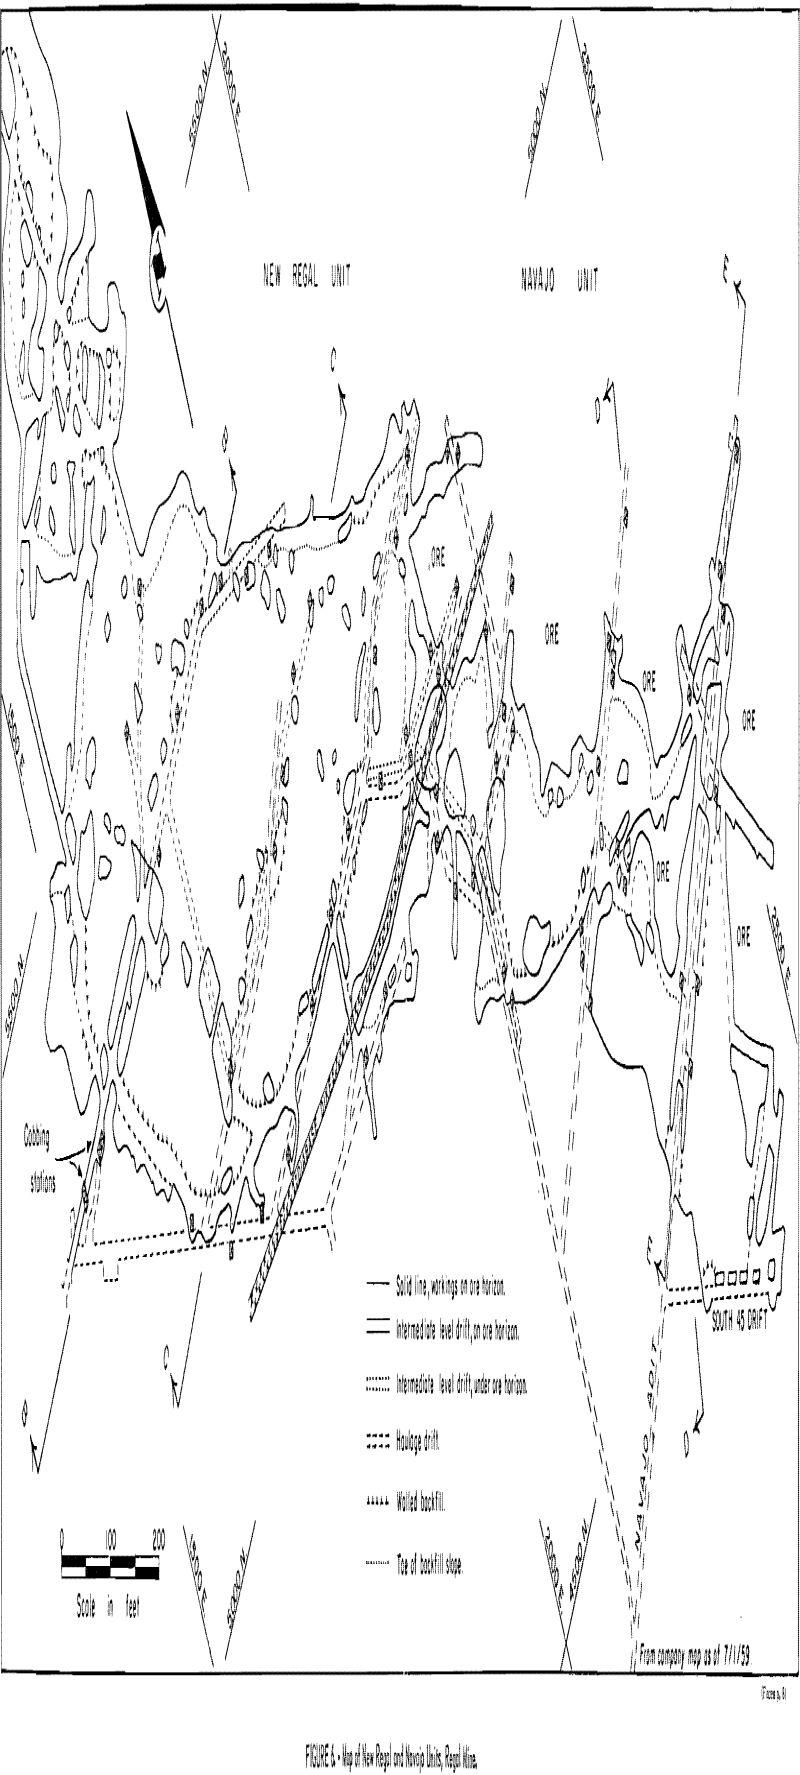 mining methods costs map